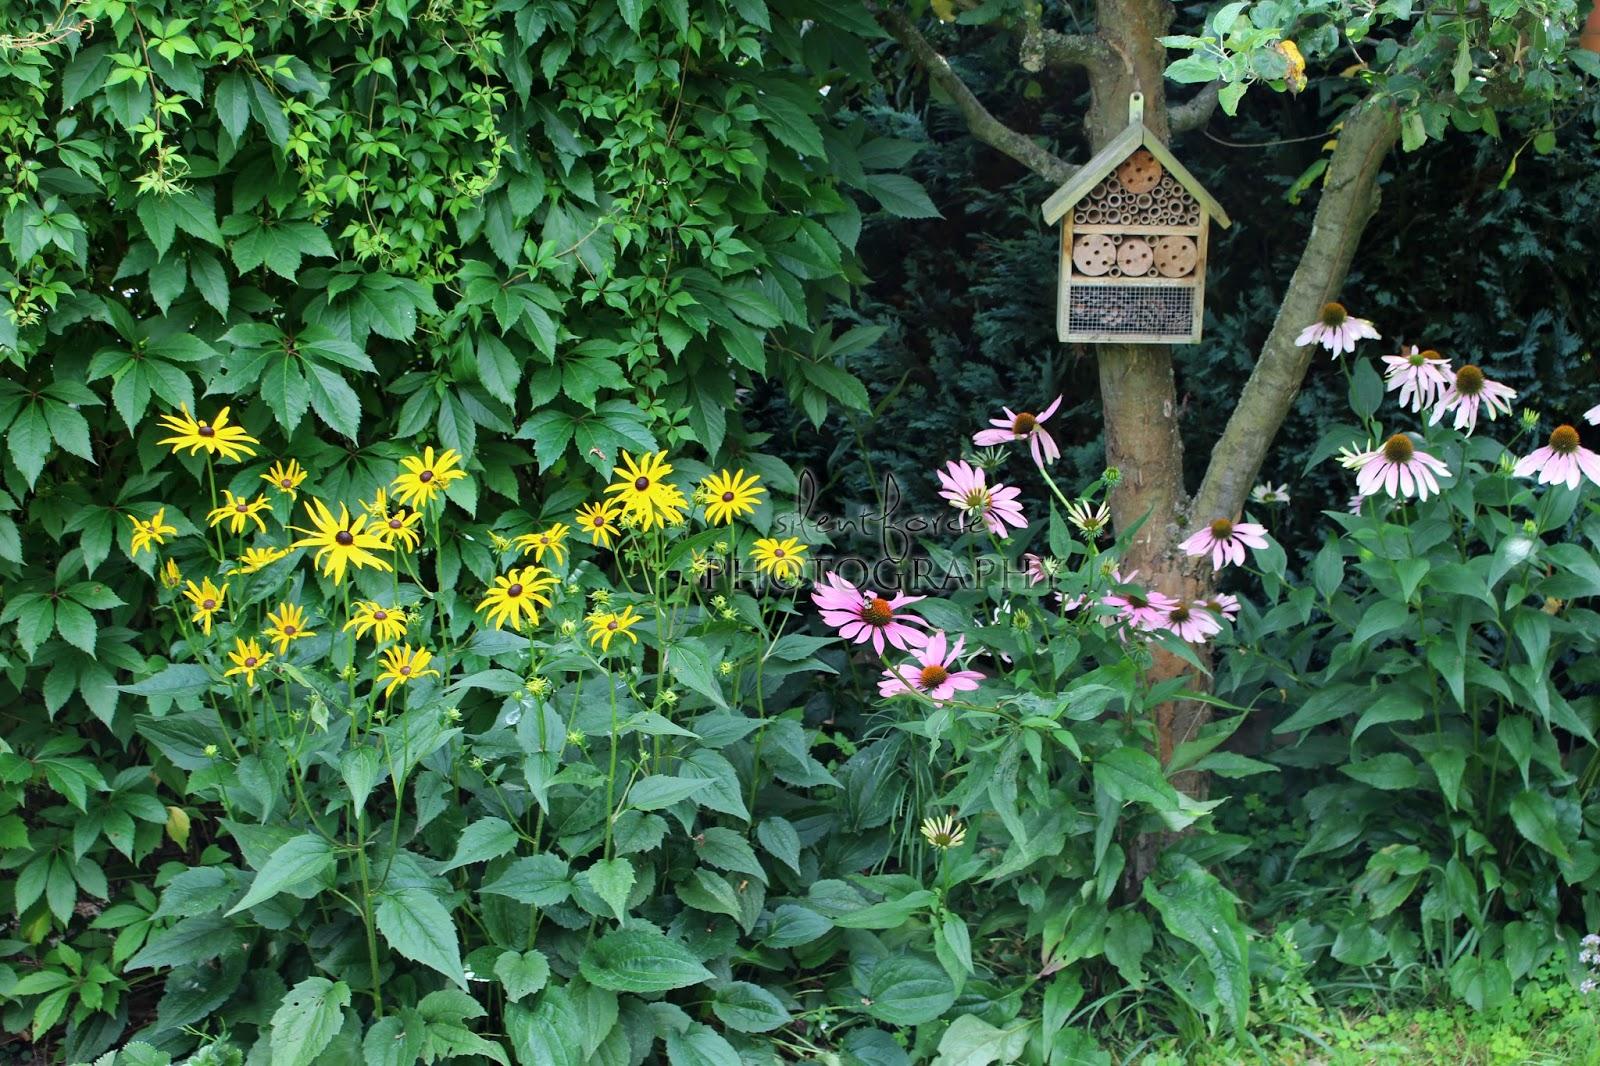 zauberhafter sonnenhut silentforce garden. Black Bedroom Furniture Sets. Home Design Ideas